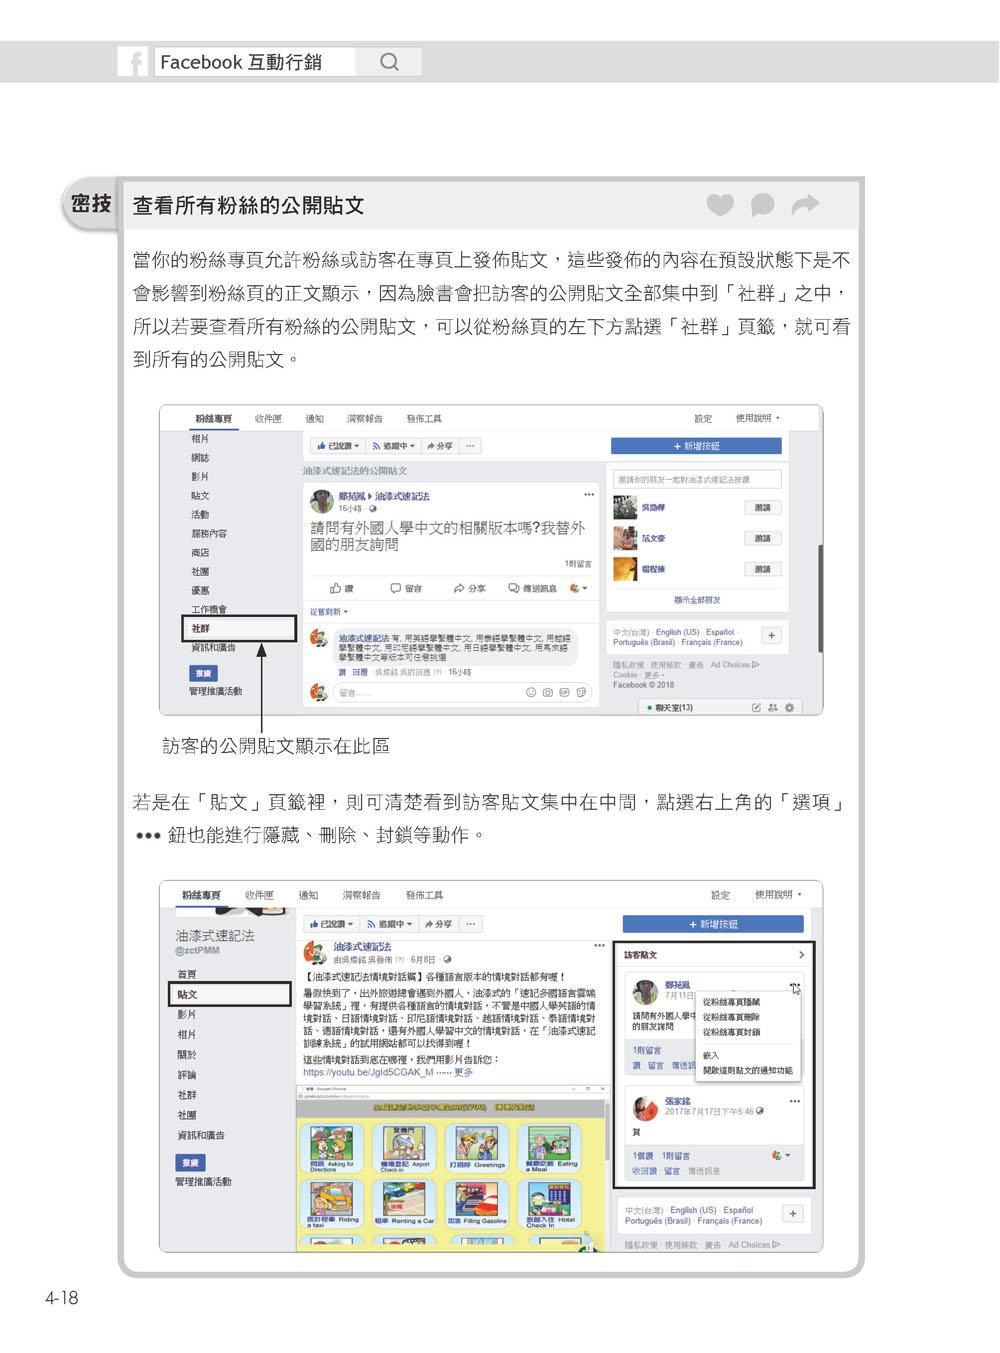 Facebook 互動行銷:社群口碑經營新思路+廣告投放如何有成效,想做好臉書行銷,操作心法就在這!-preview-36